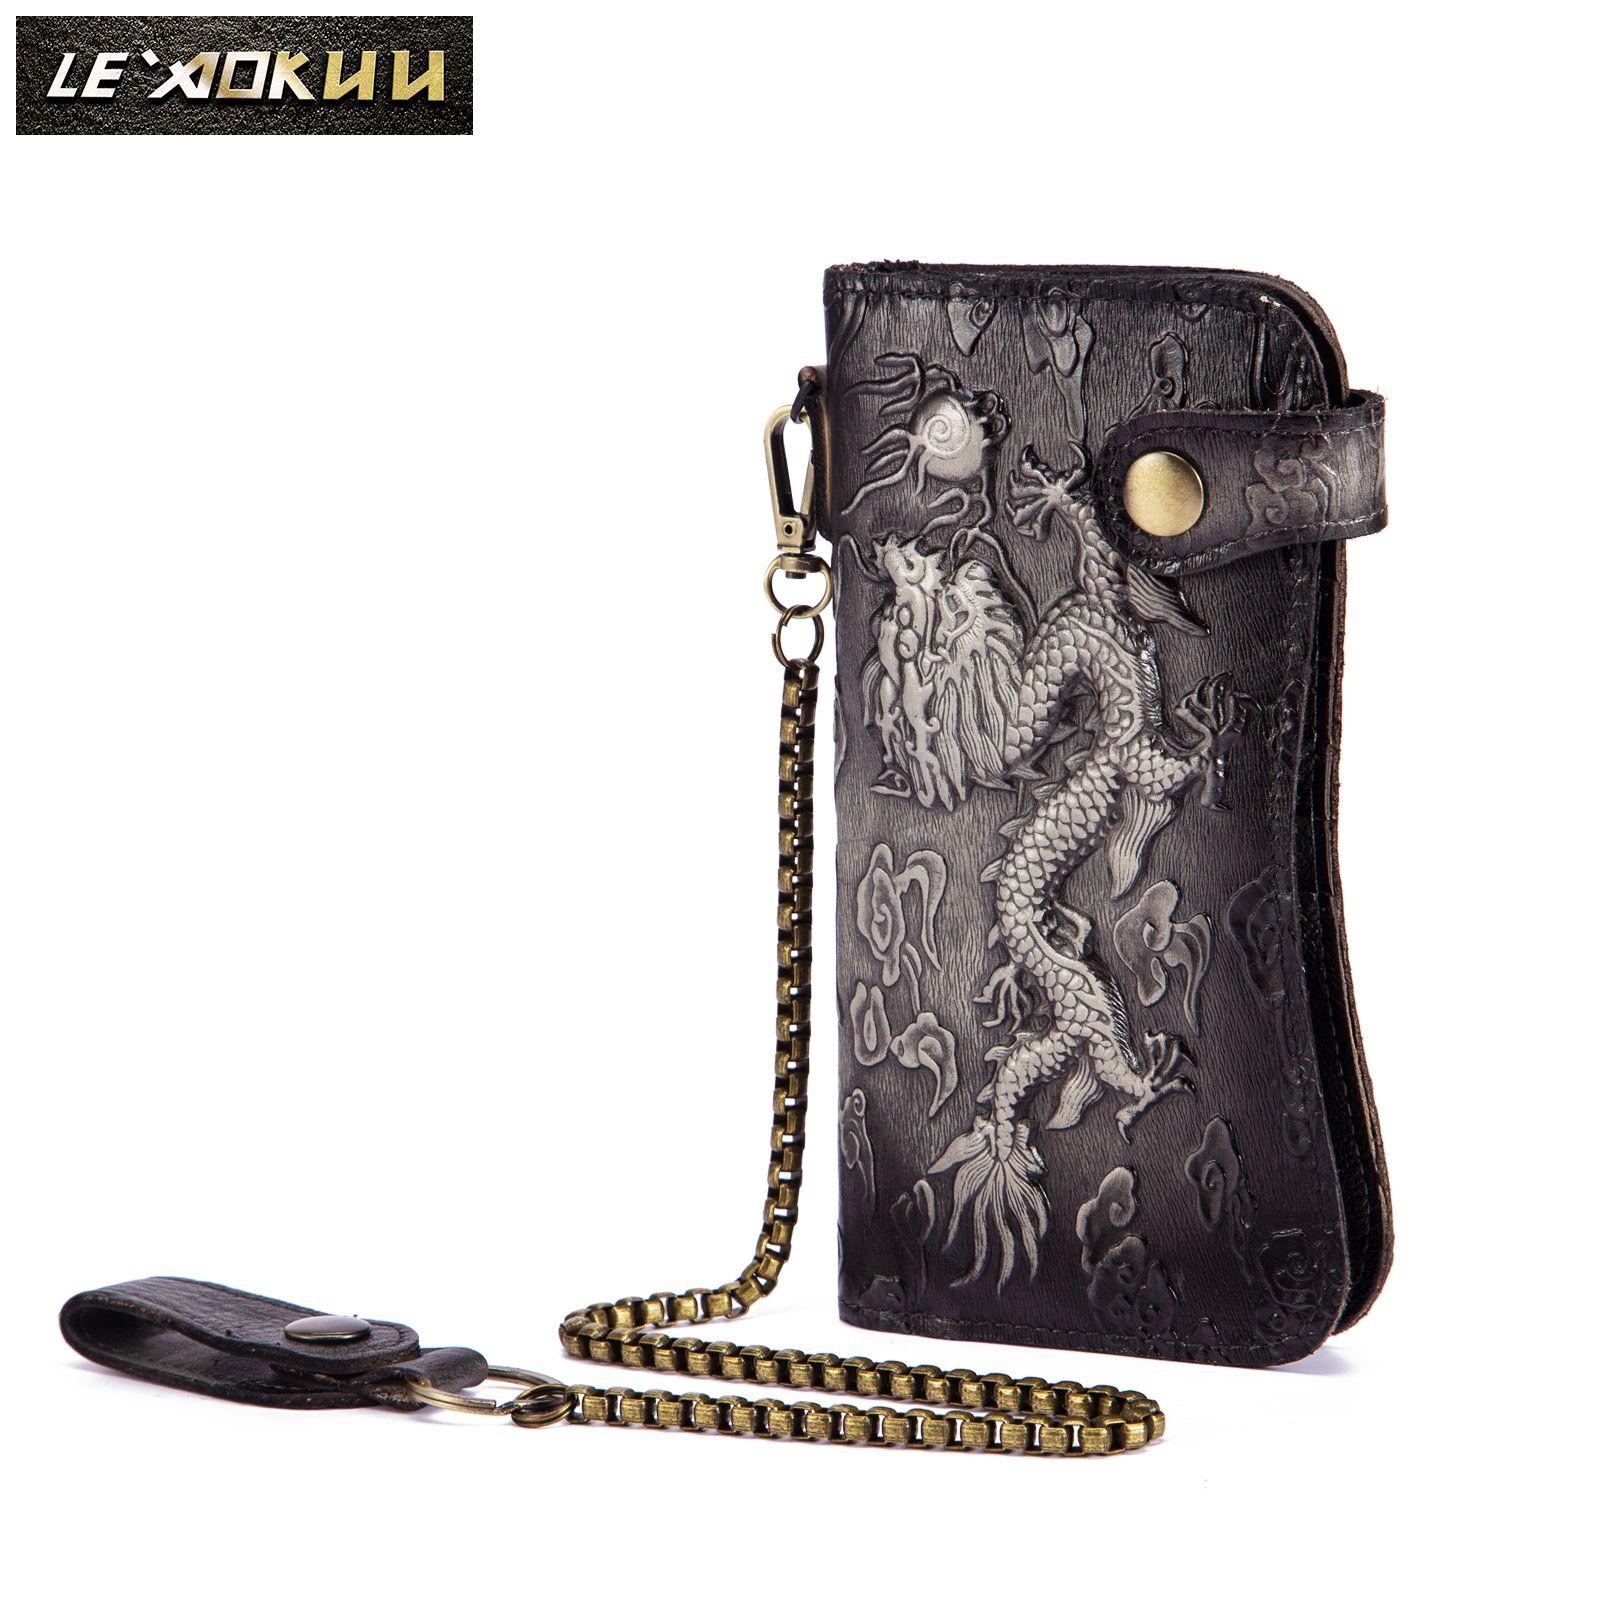 Cattle Male Organizal Real leather Design Dargon Tiger Emboss Checkbook Iron Chain Wallet Purse Clutch Handbag N1088